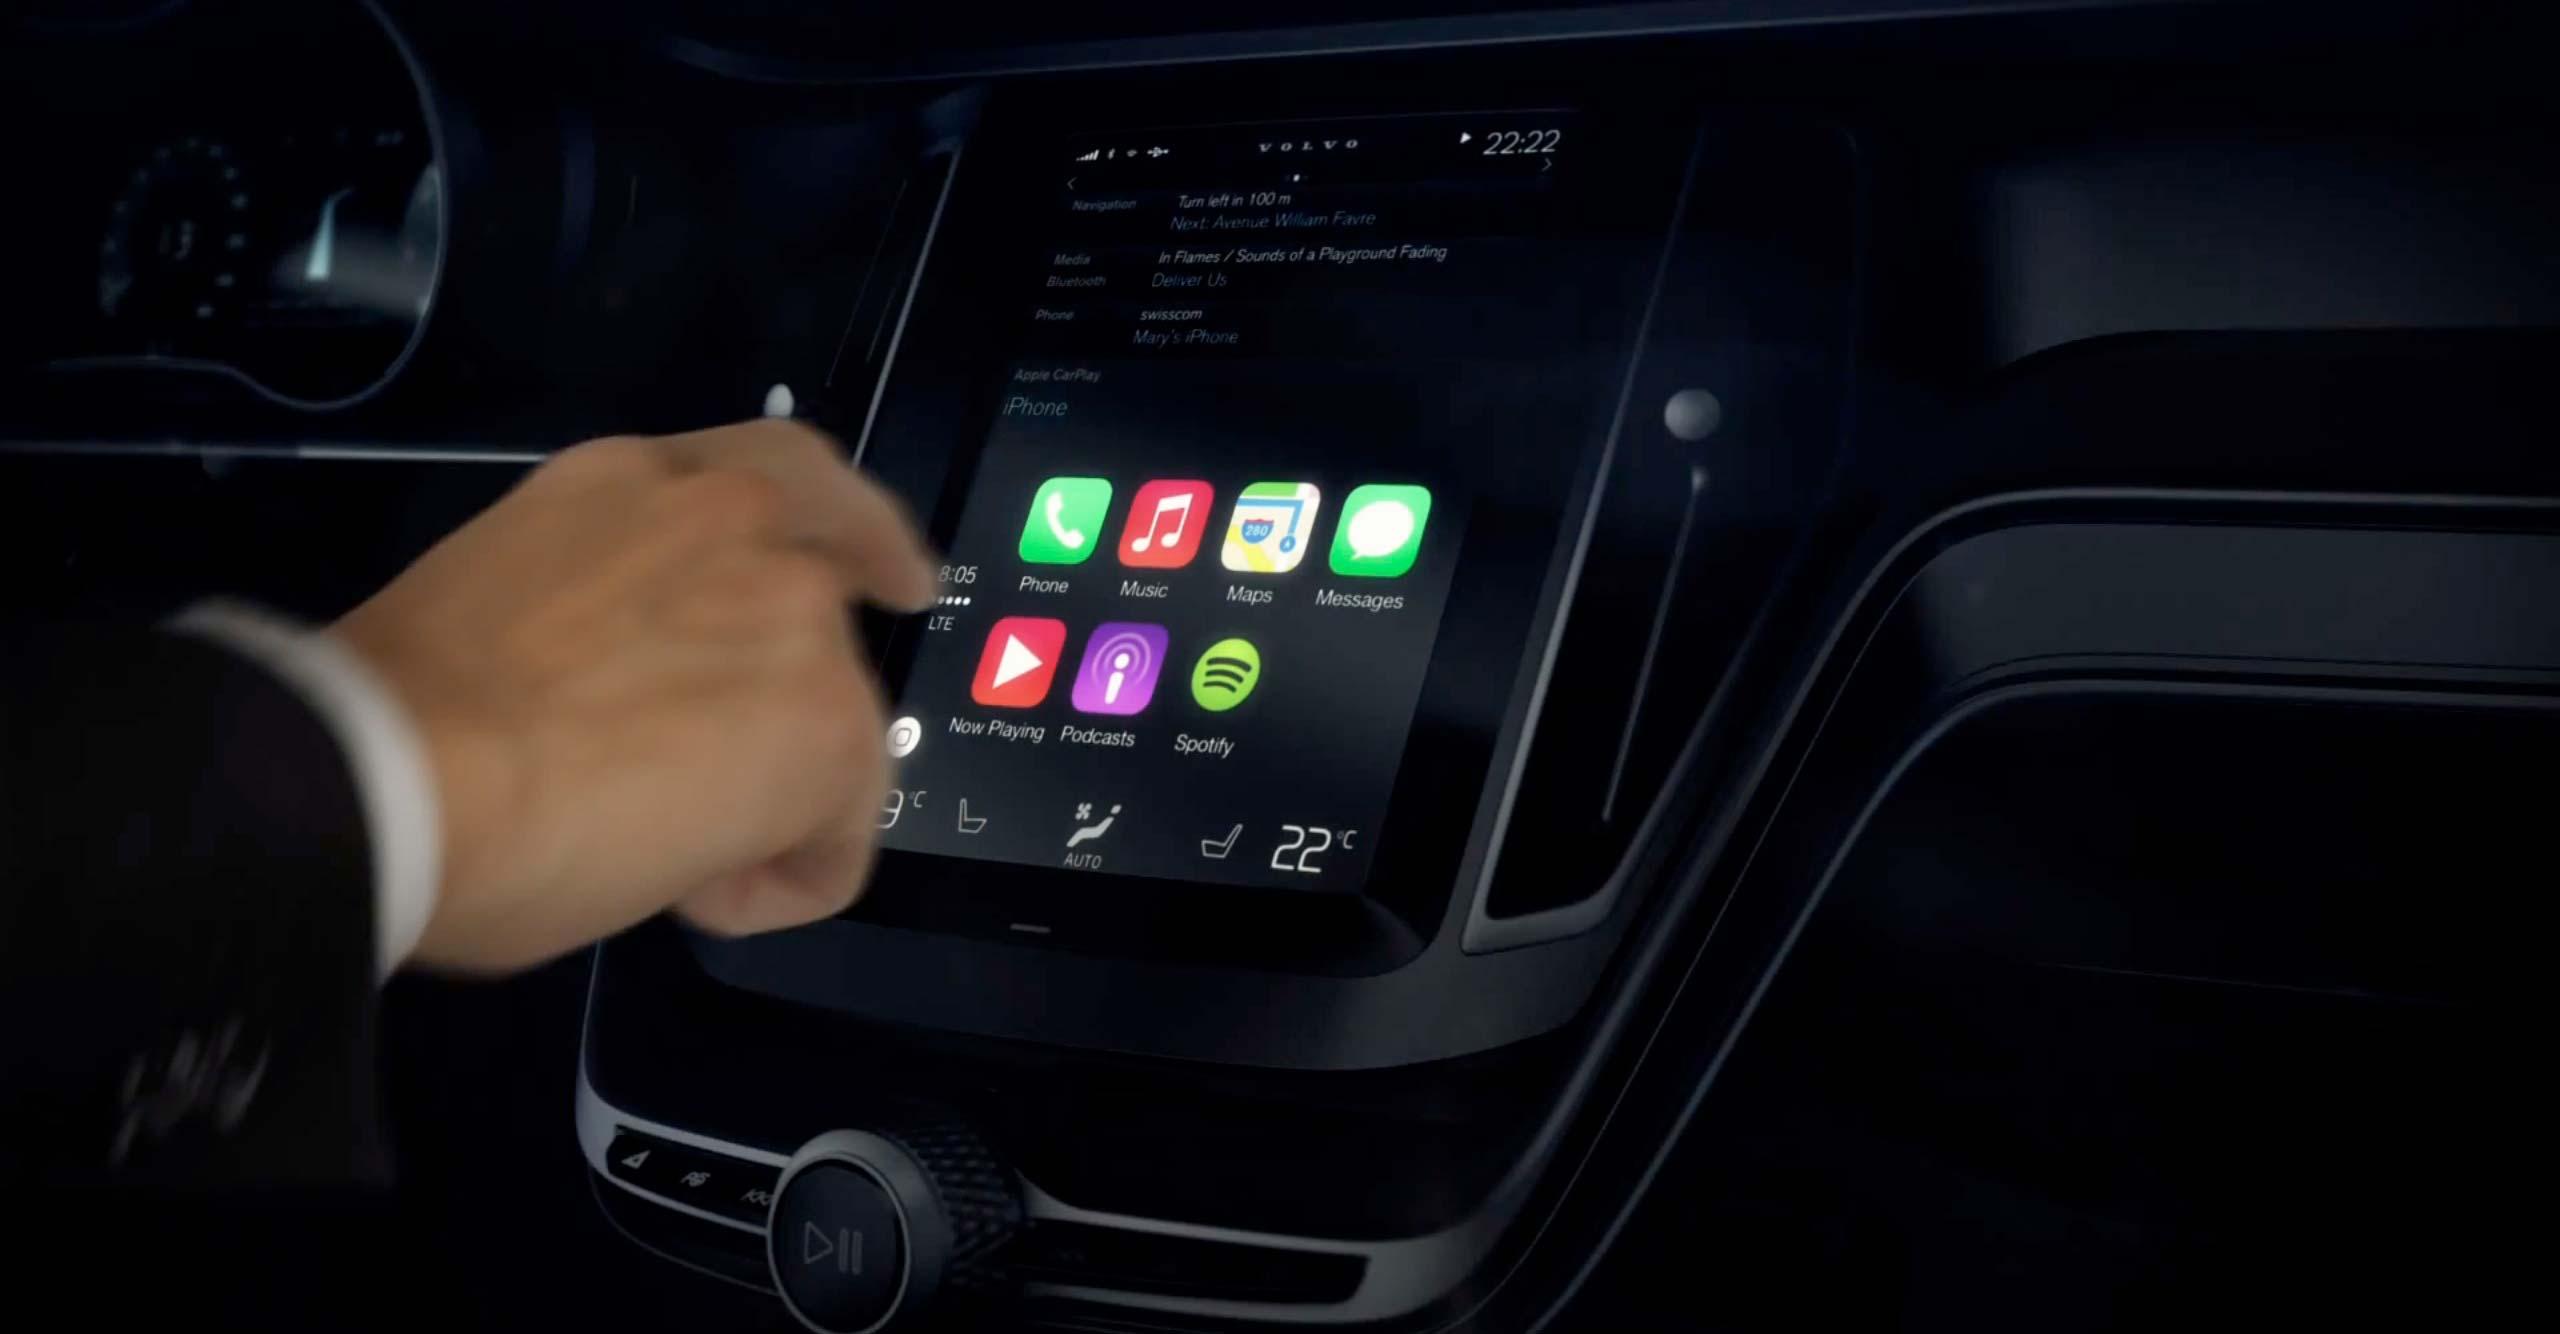 Otomobilde Carplay Teknolojisi